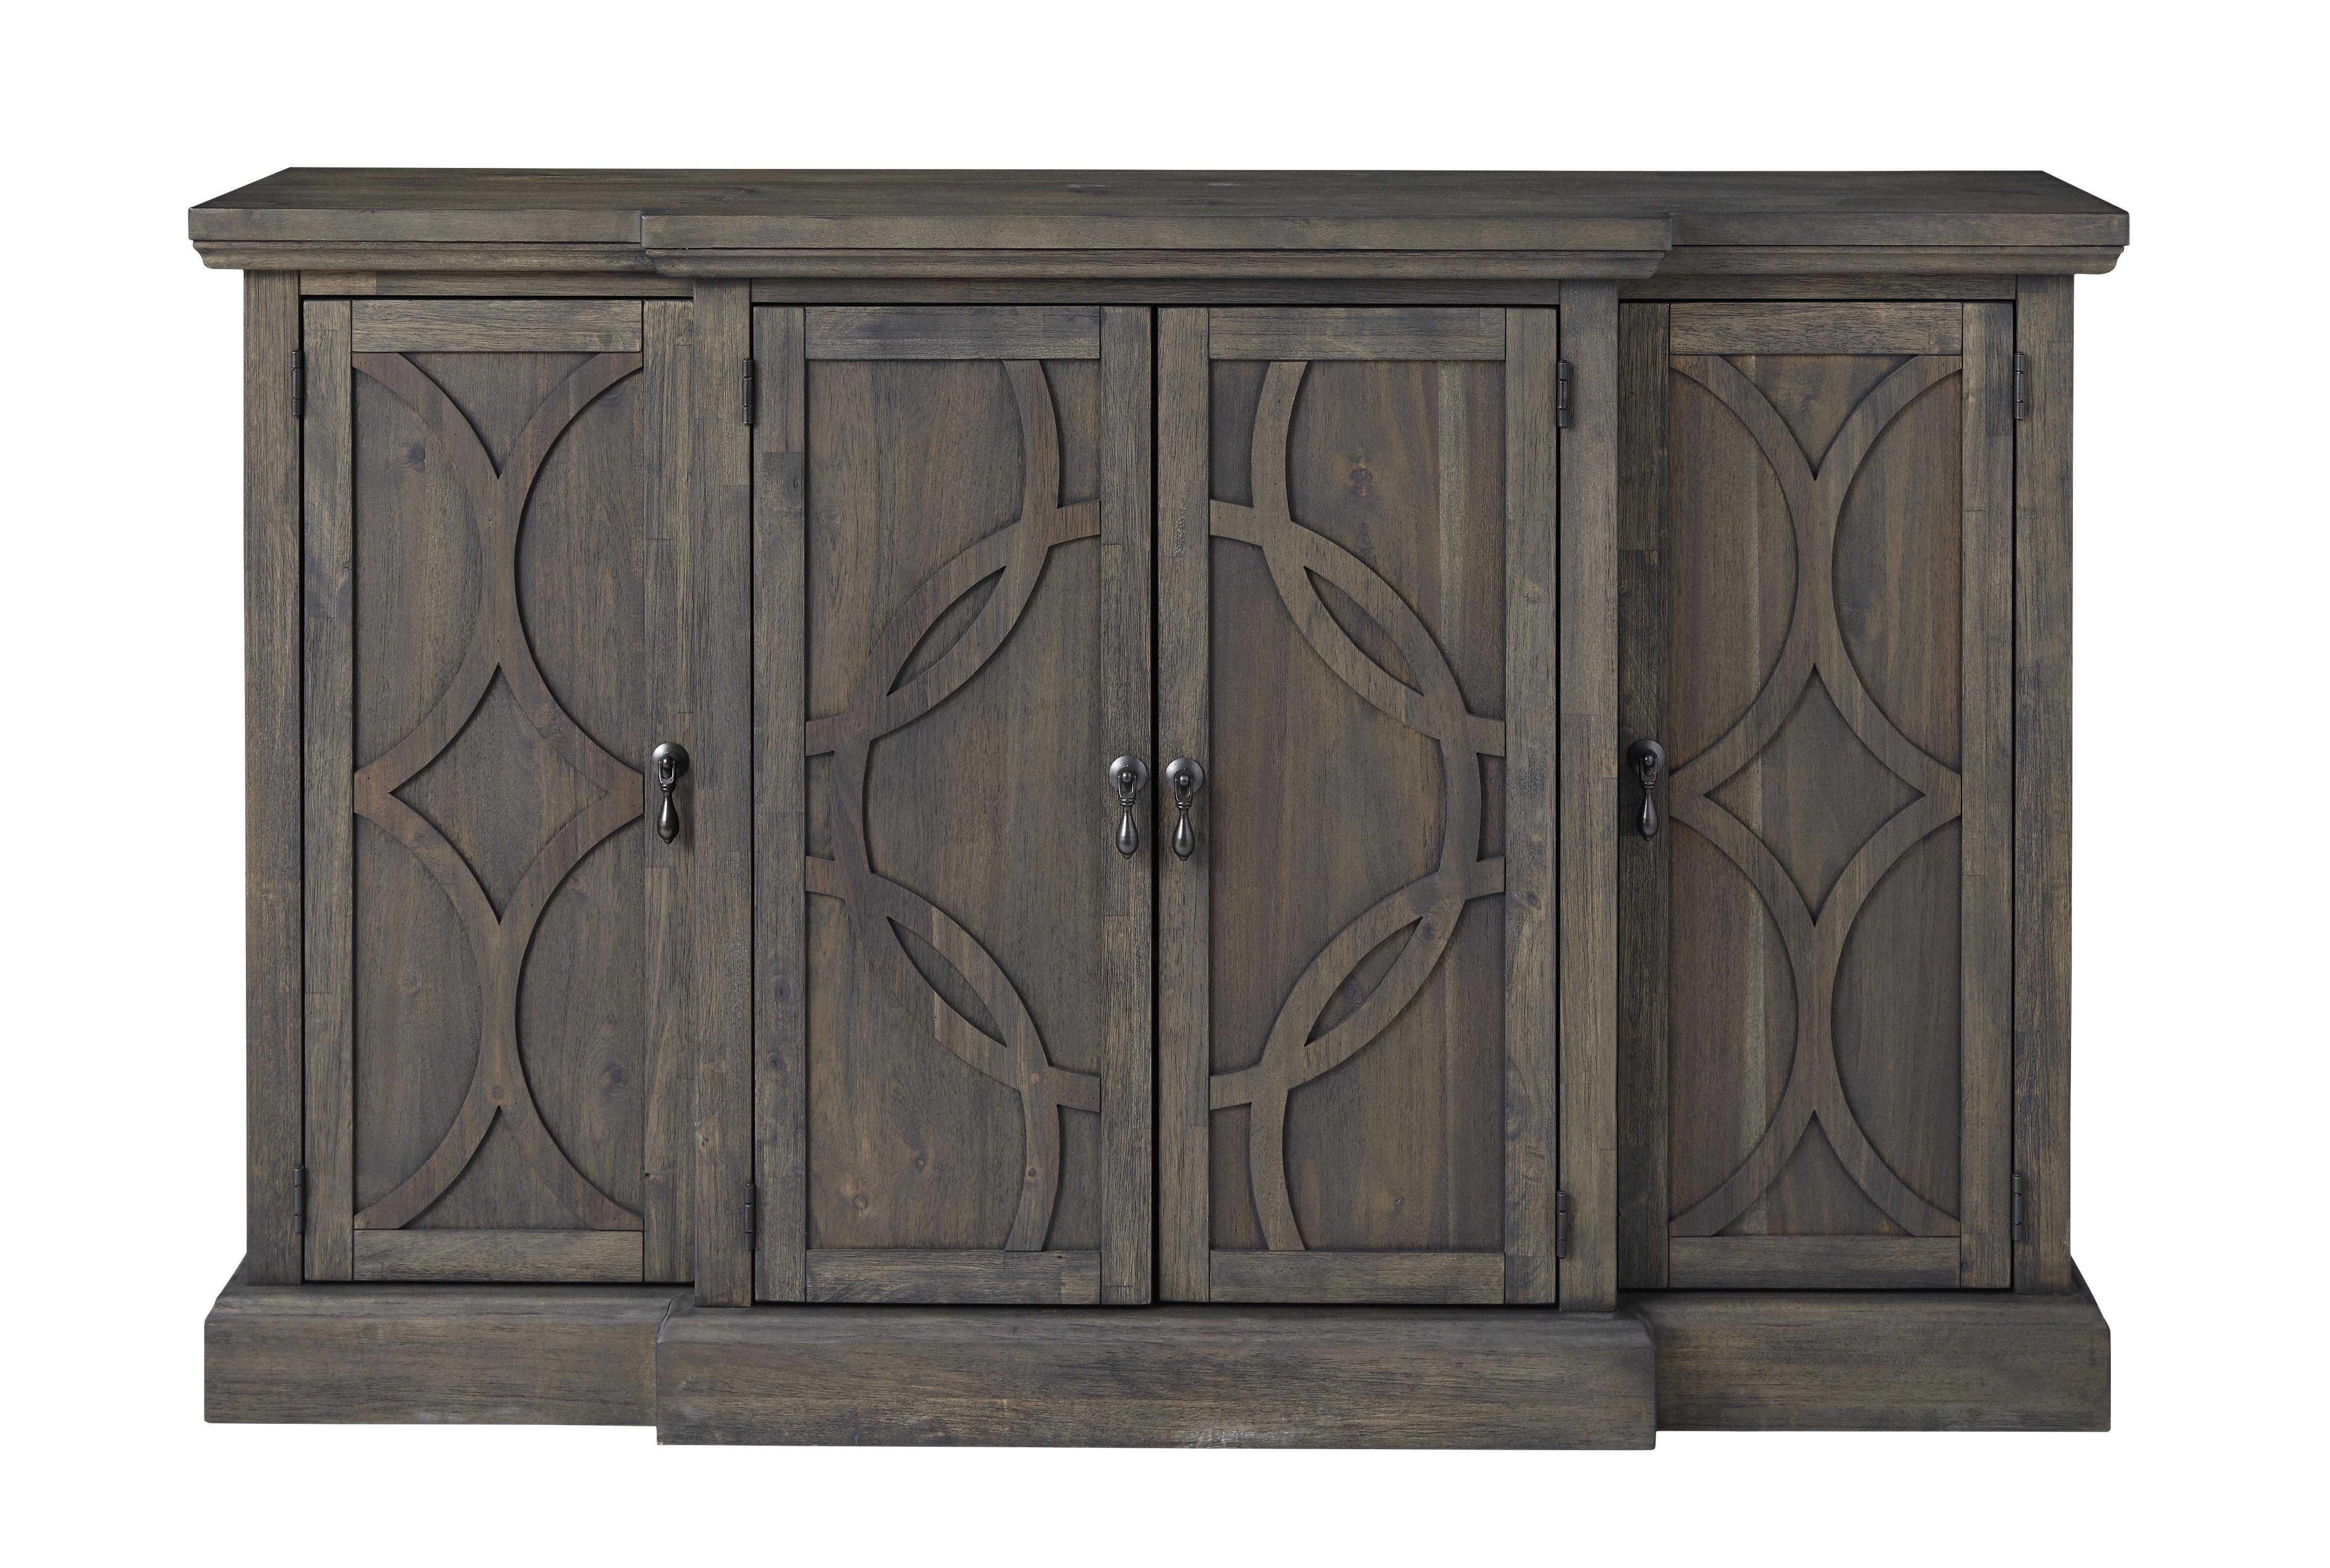 Medium Oak Sideboard | Wayfair For Fortville Sideboards (View 17 of 20)